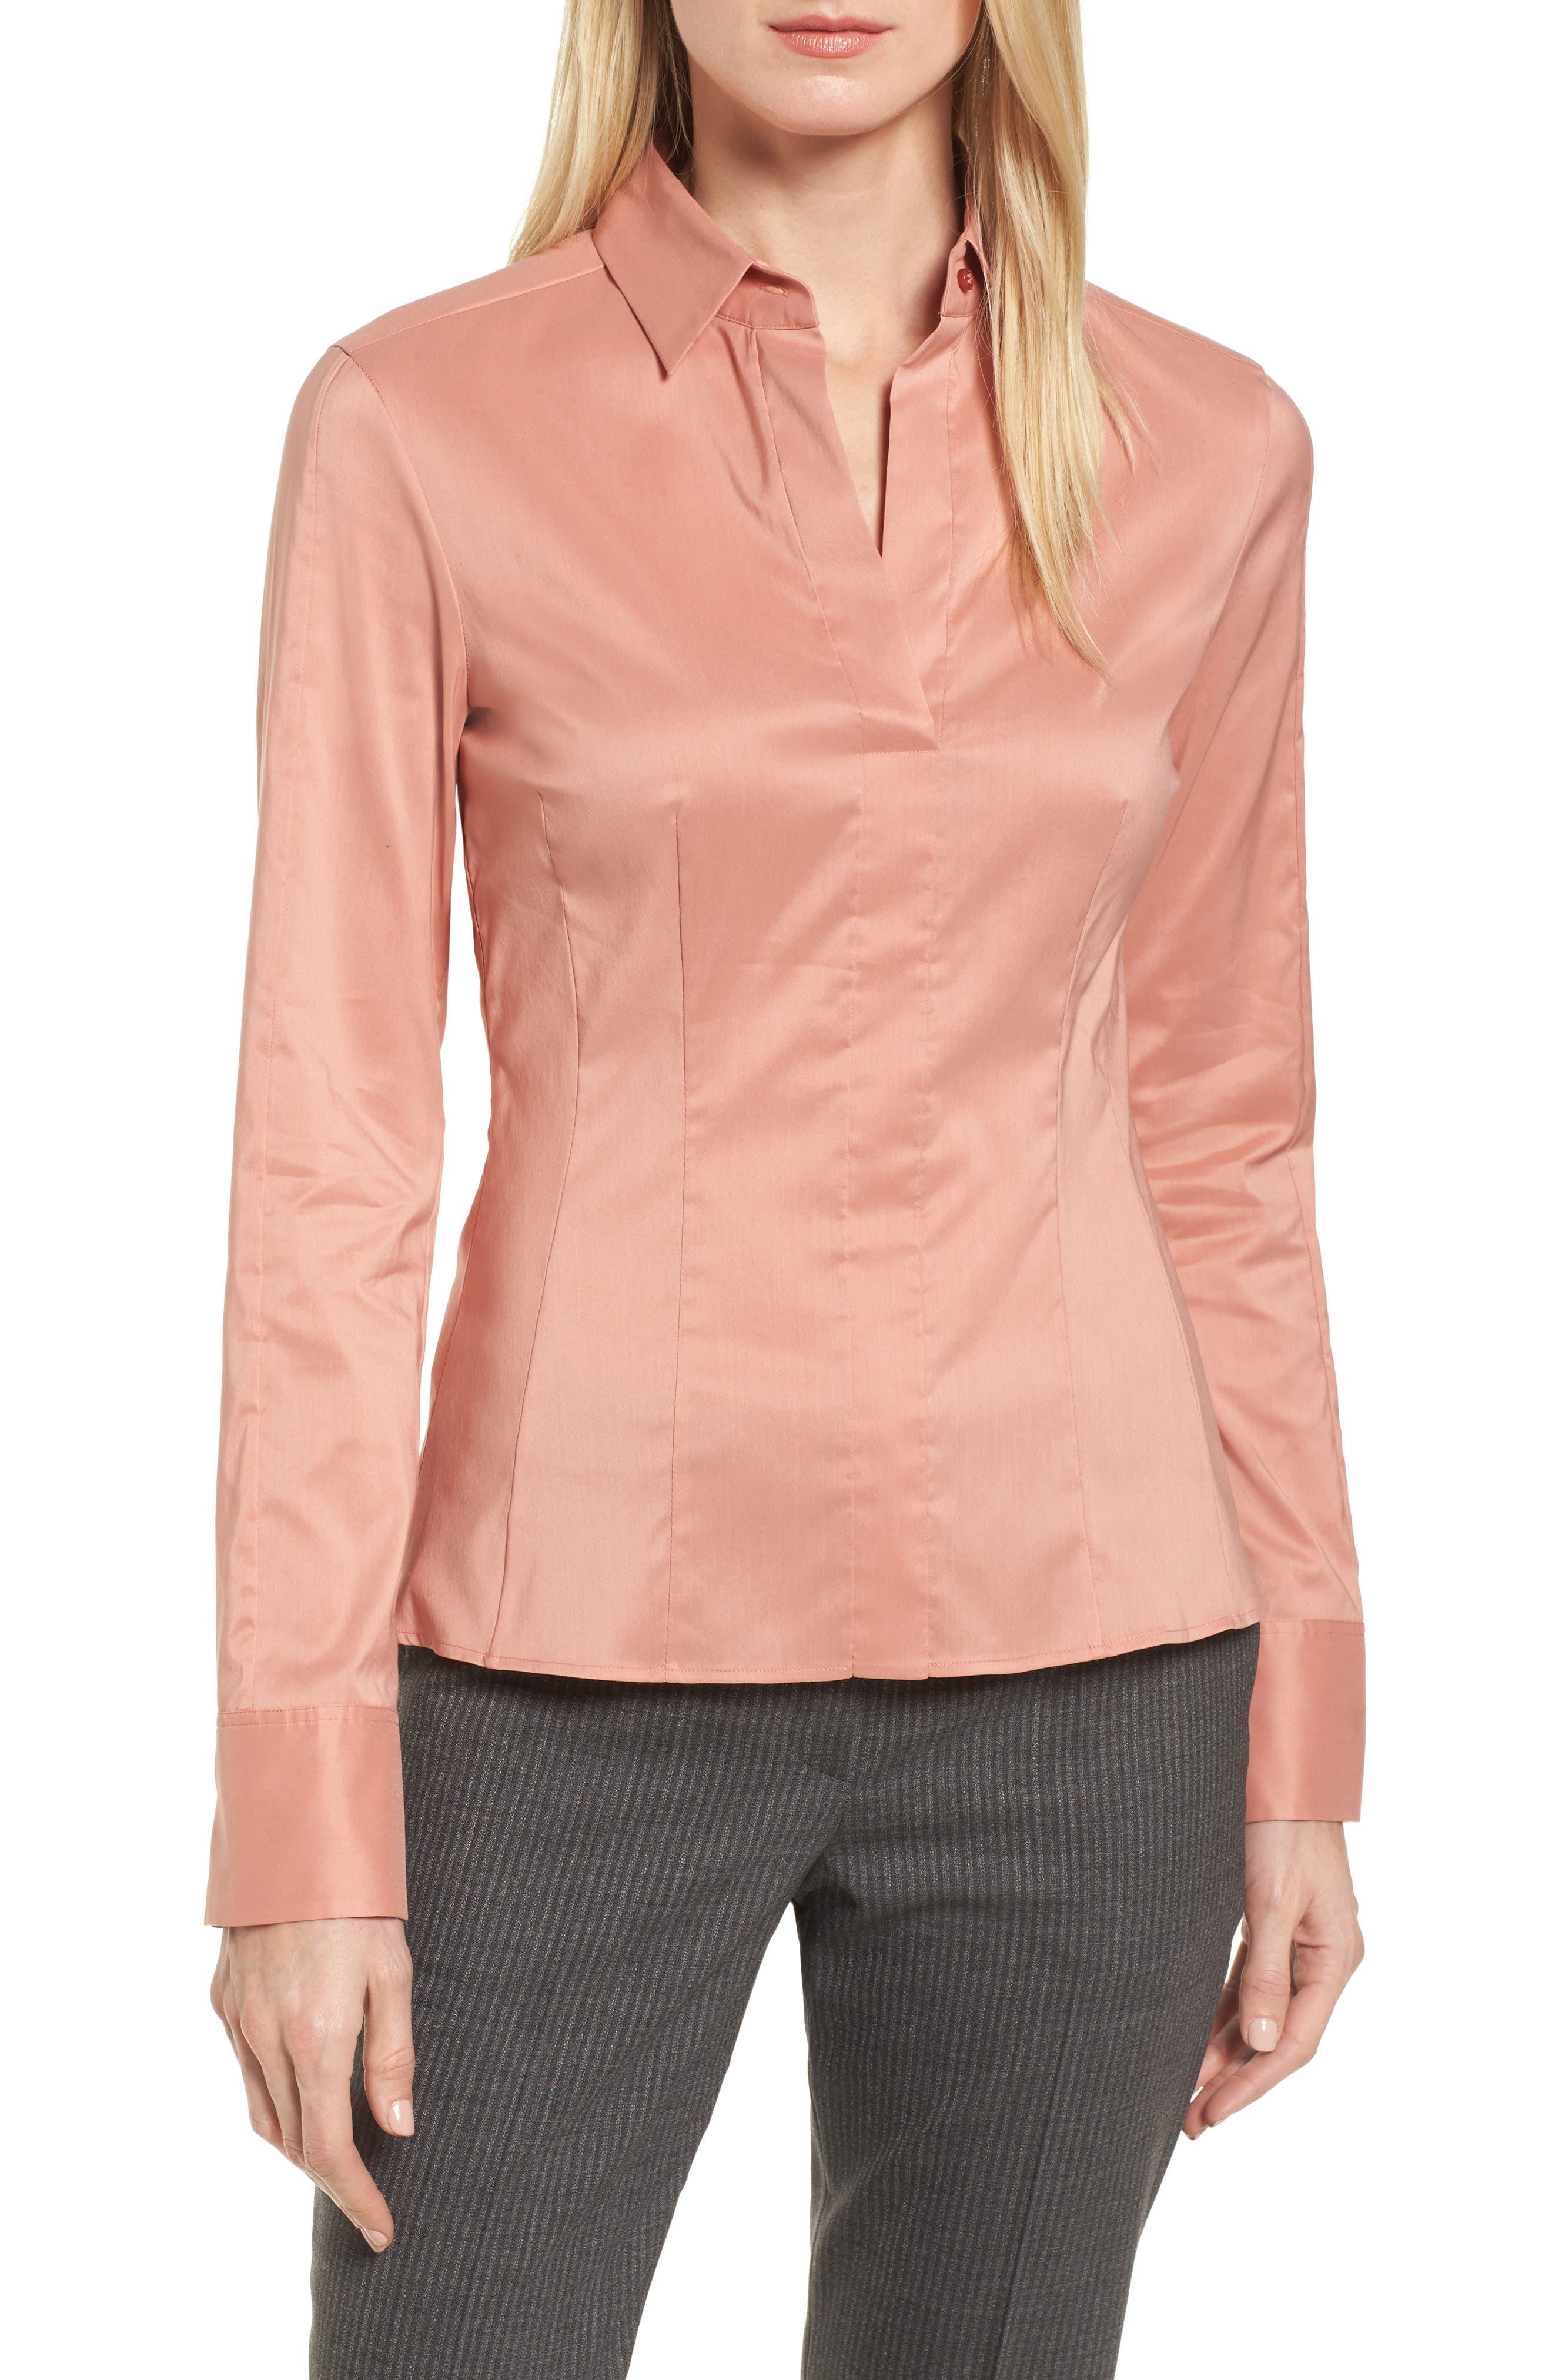 Bashina Fitted Stretch Poplin Shirt,                             Main thumbnail 1, color,                             Sand Rose